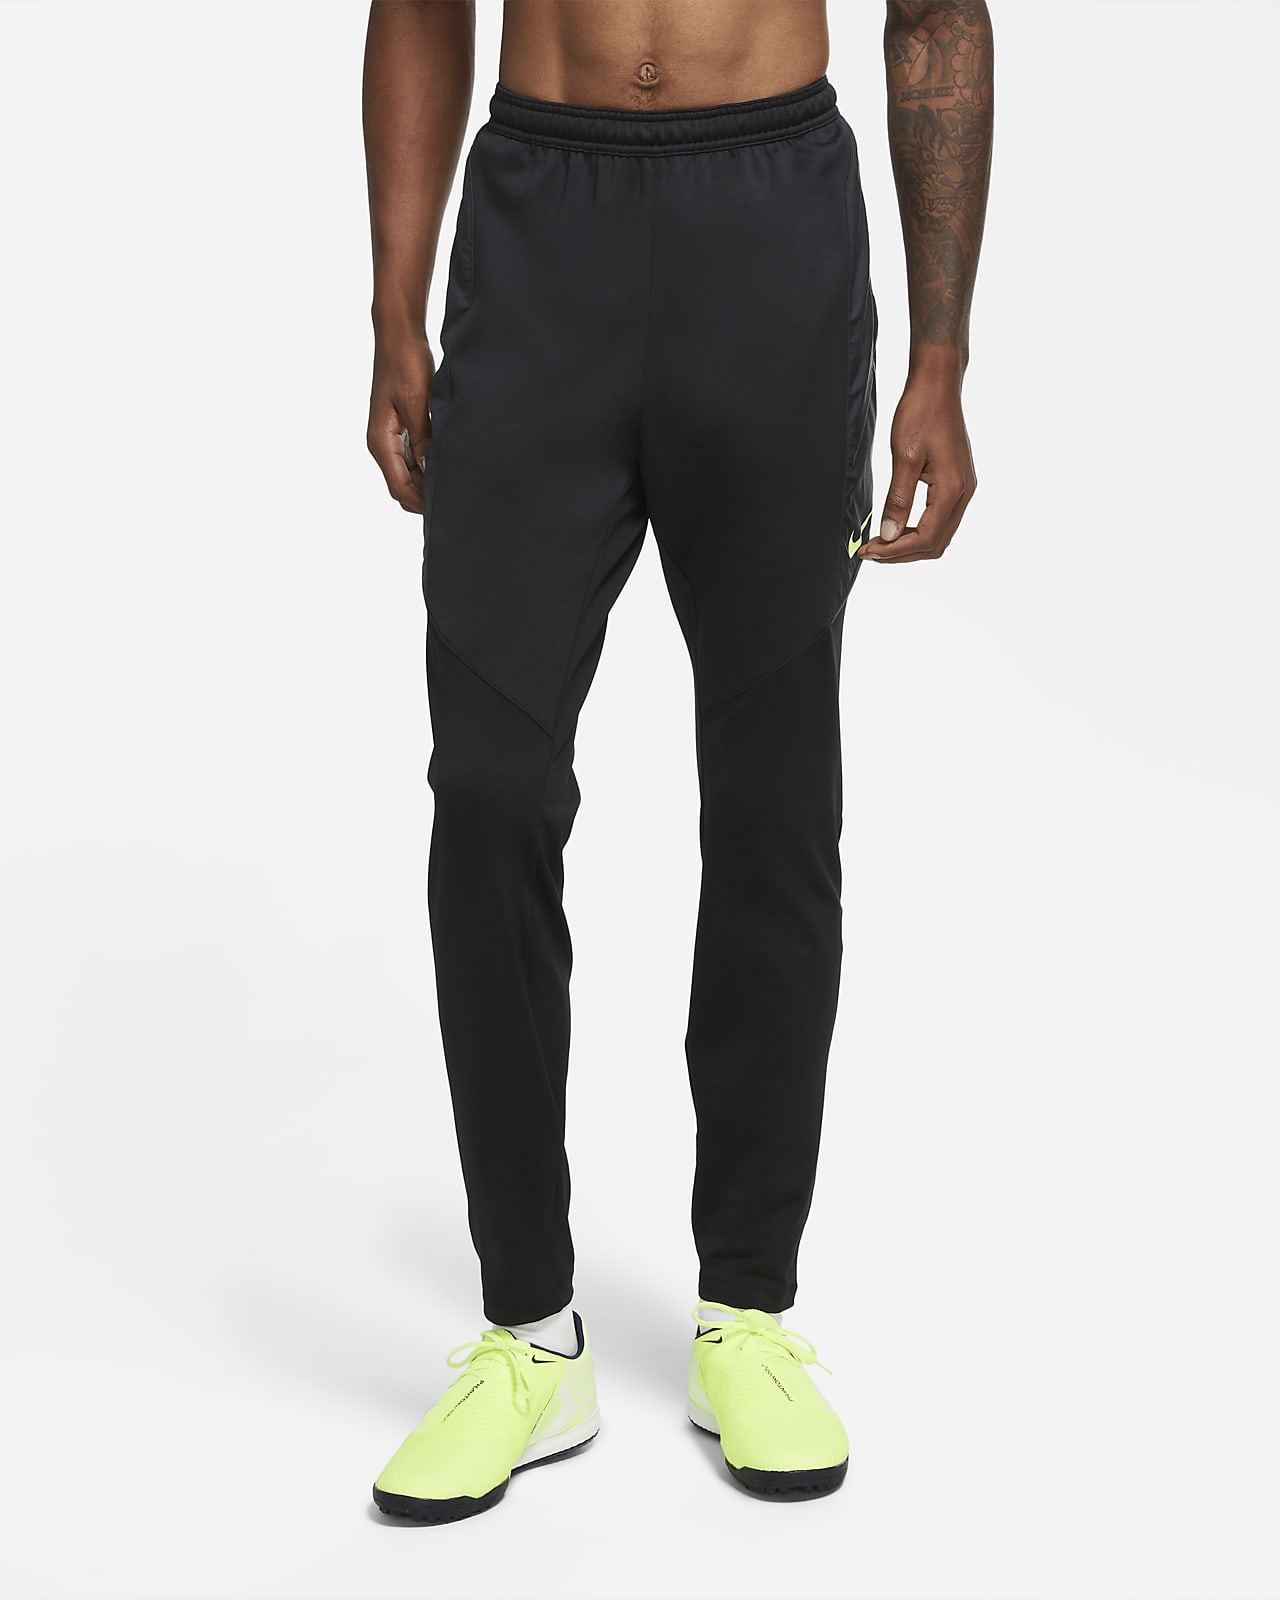 Pantaloni da calcio Nike Dri-FIT Strike Winter Warrior - Uomo